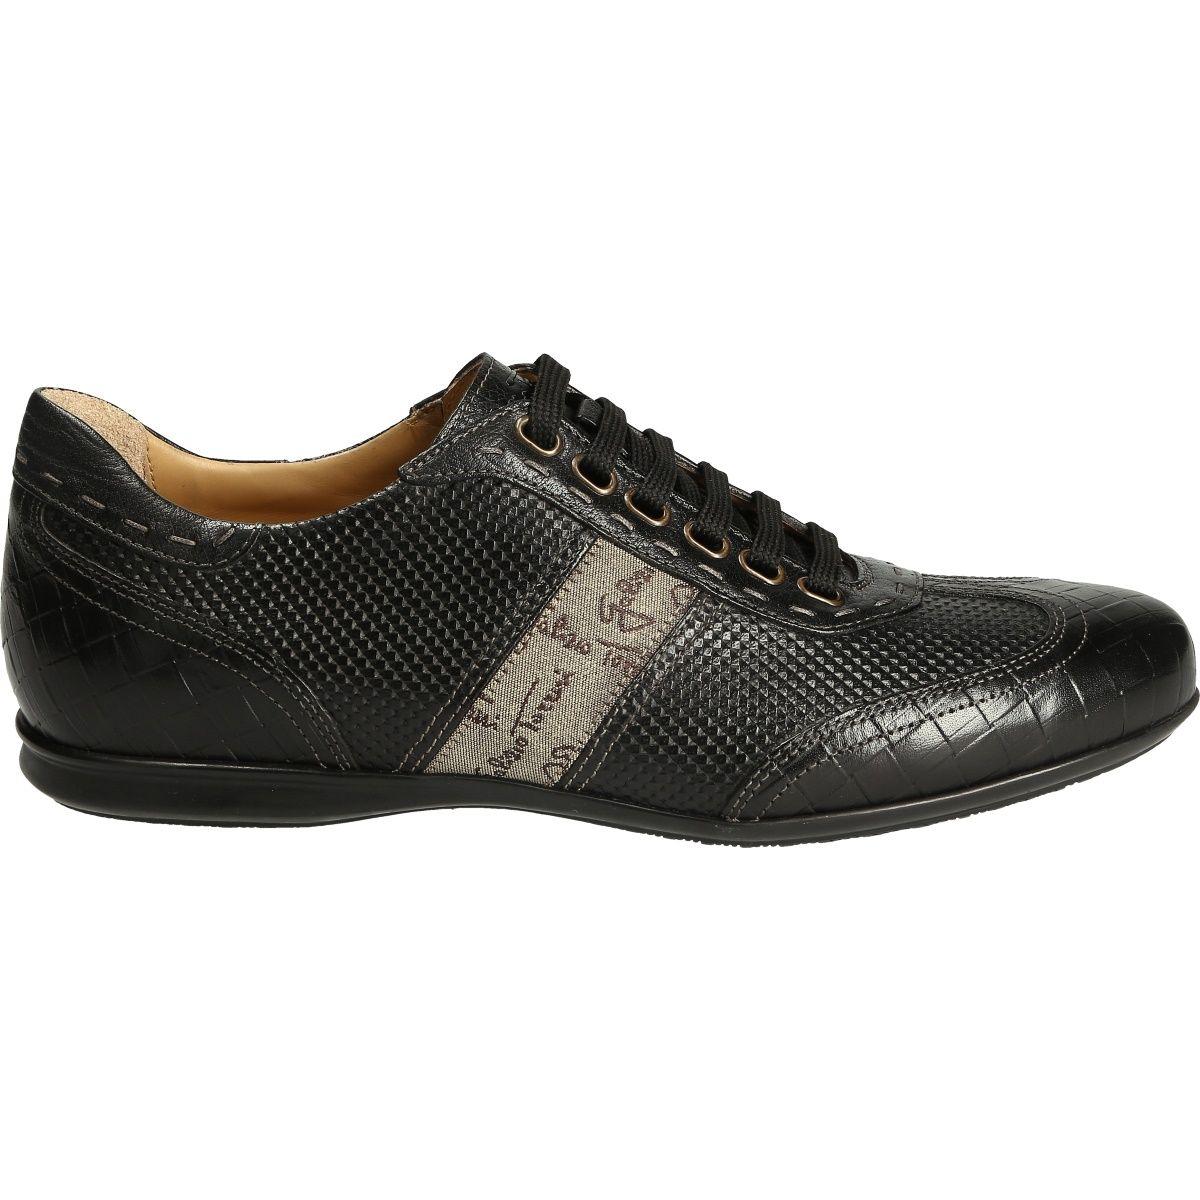 Galizio Torresi 318064 V17142 Men S Shoes Lace Ups Buy